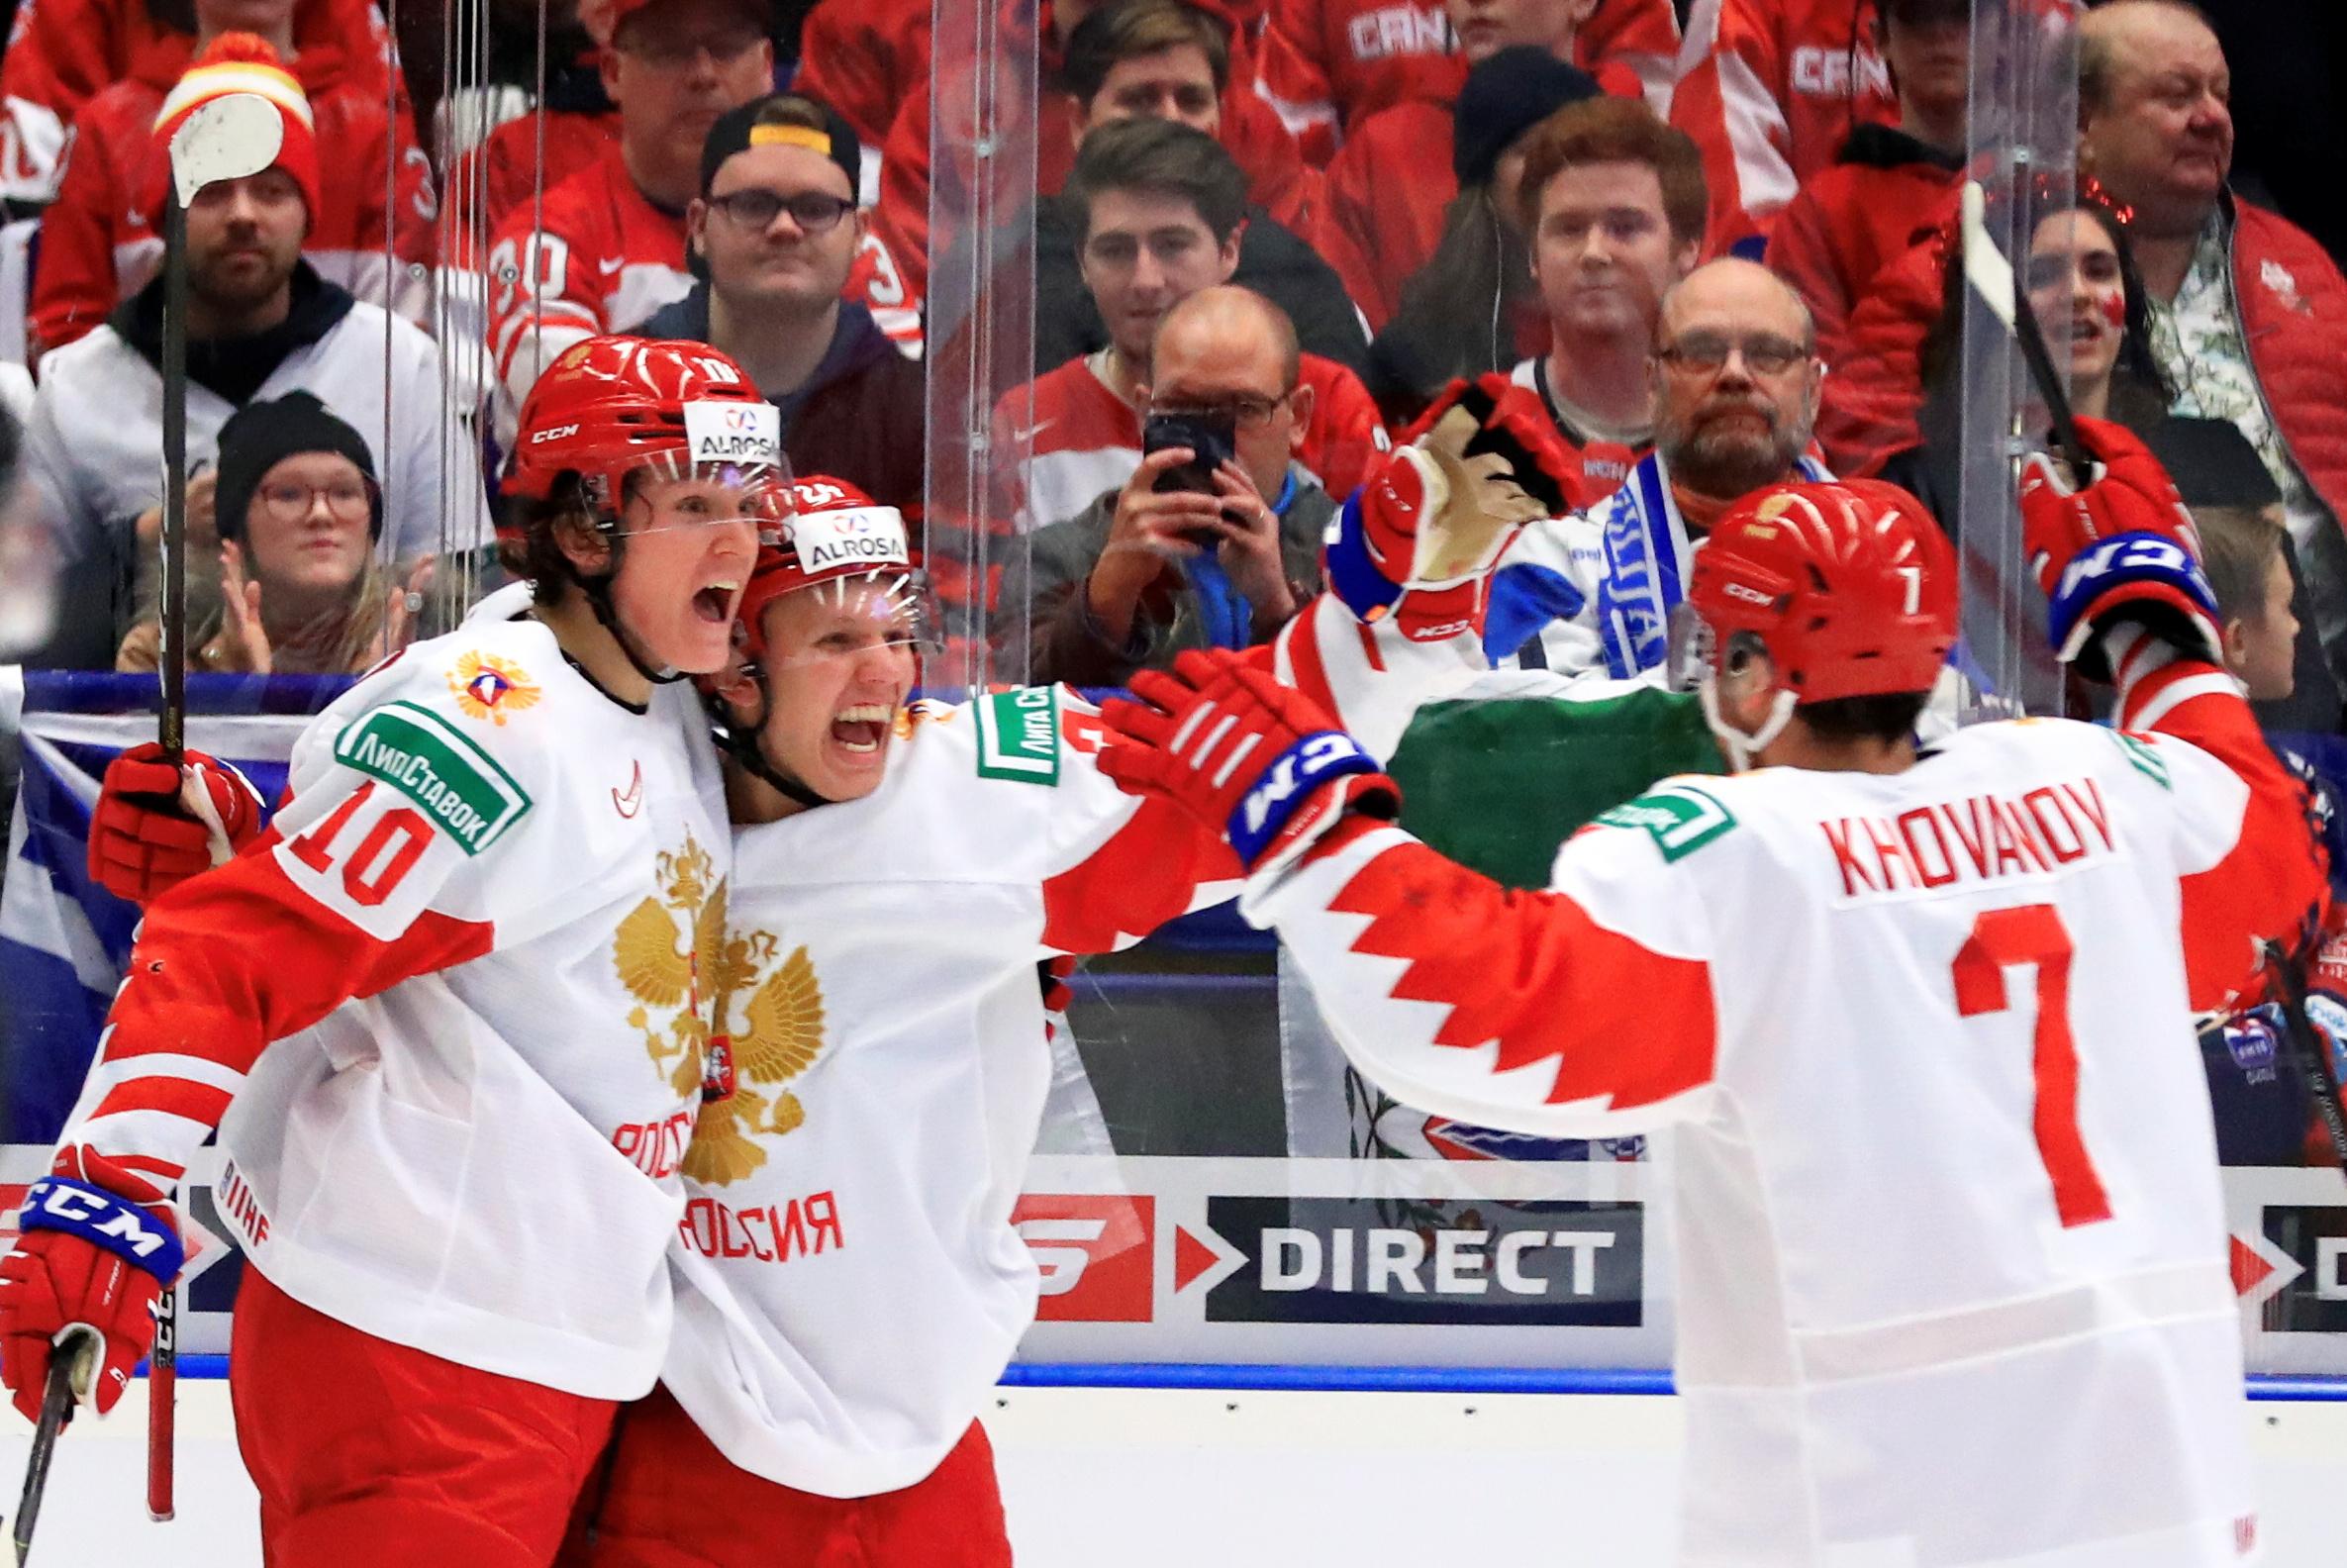 OSTRAVA, CZECH REPUBLIC - JANUARY 5, 2020: Russia's Dmitry Voronkov, Nikita Aleksandrov, and Alexander Khovanov (L-R) celebrate a goal in the 2020 World Junior Ice Hockey Championship final match between Canada and Russia at Ostravar Arena.